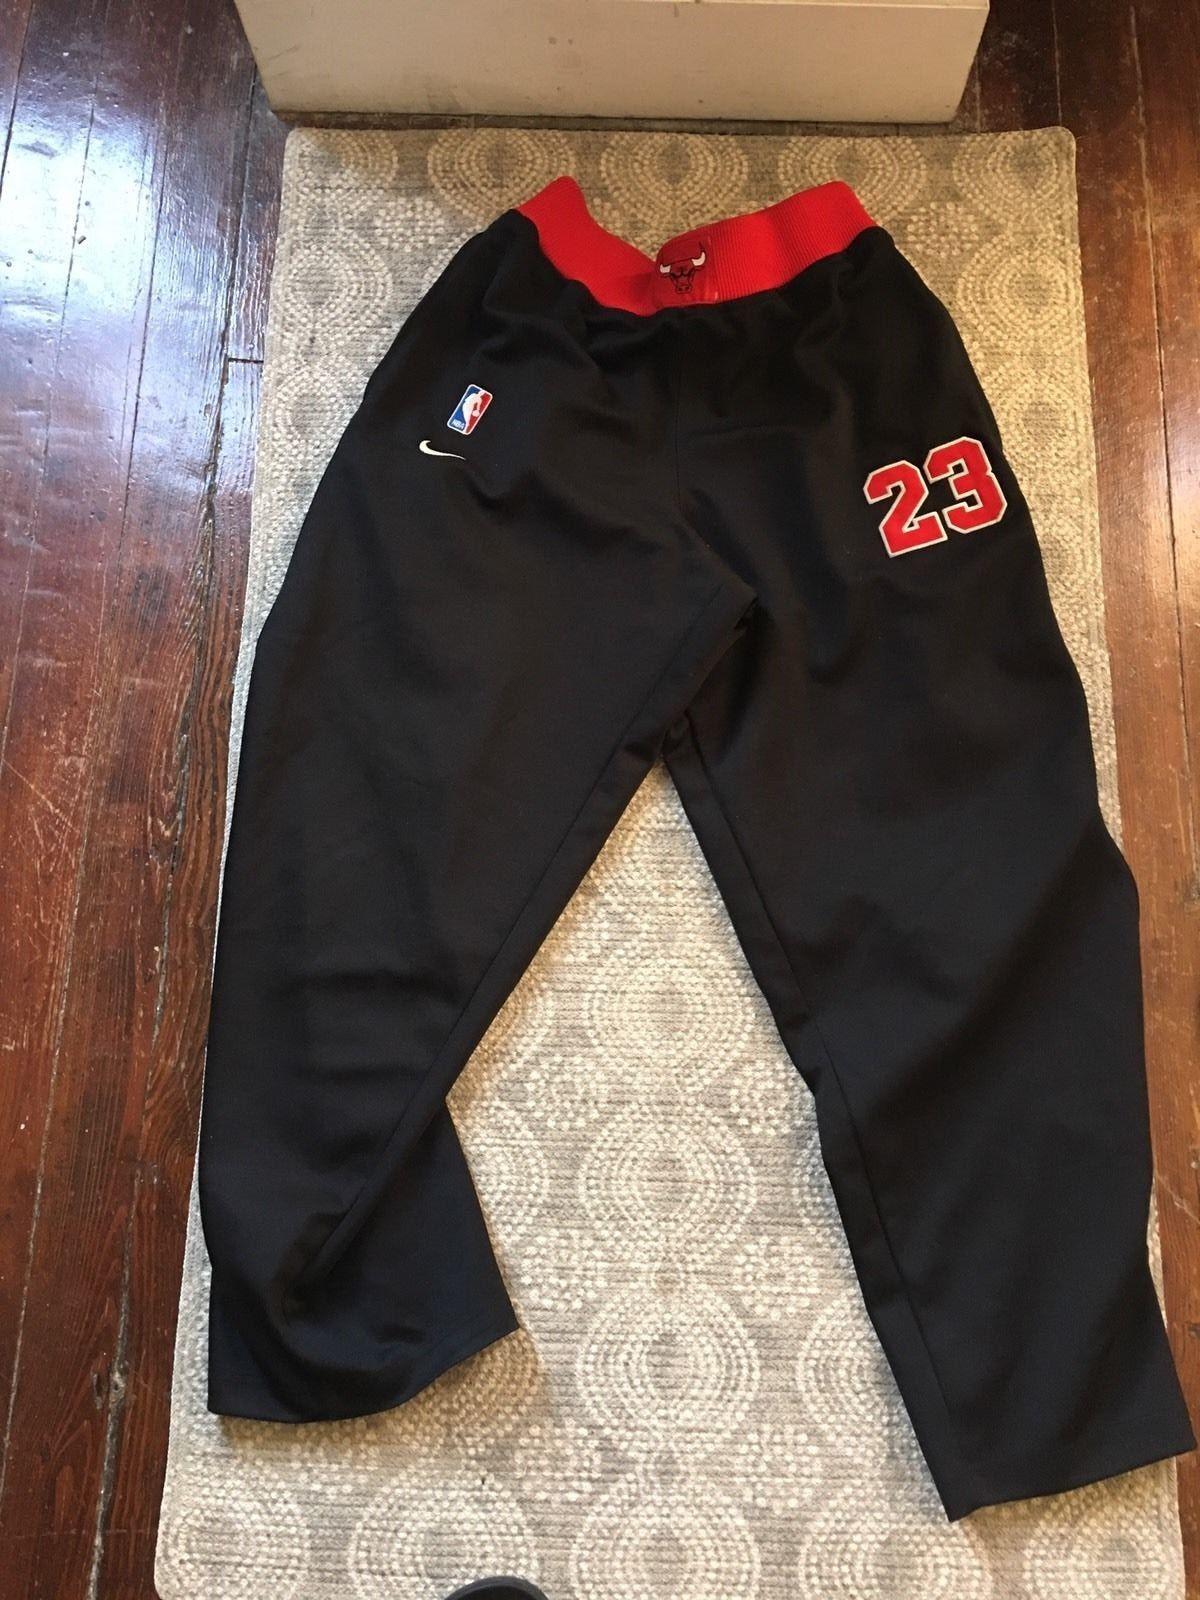 da81a854abb2 Nike Jordan Bulls Vintage Pants 90 S and 50 similar items